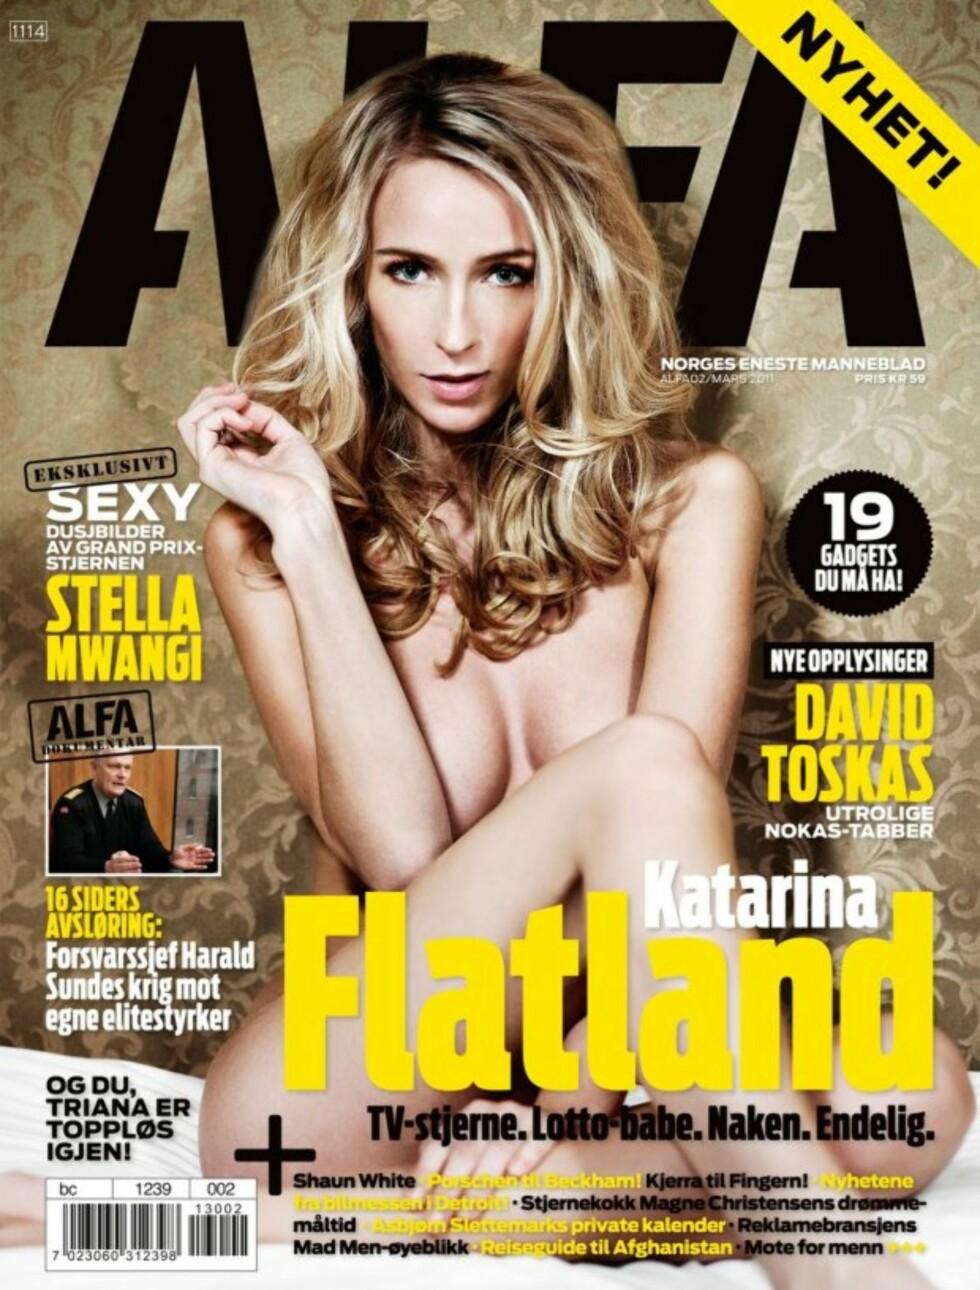 ALFA: Katarina Flatland på forsiden til ALFA i 2011. Foto: Faksimile